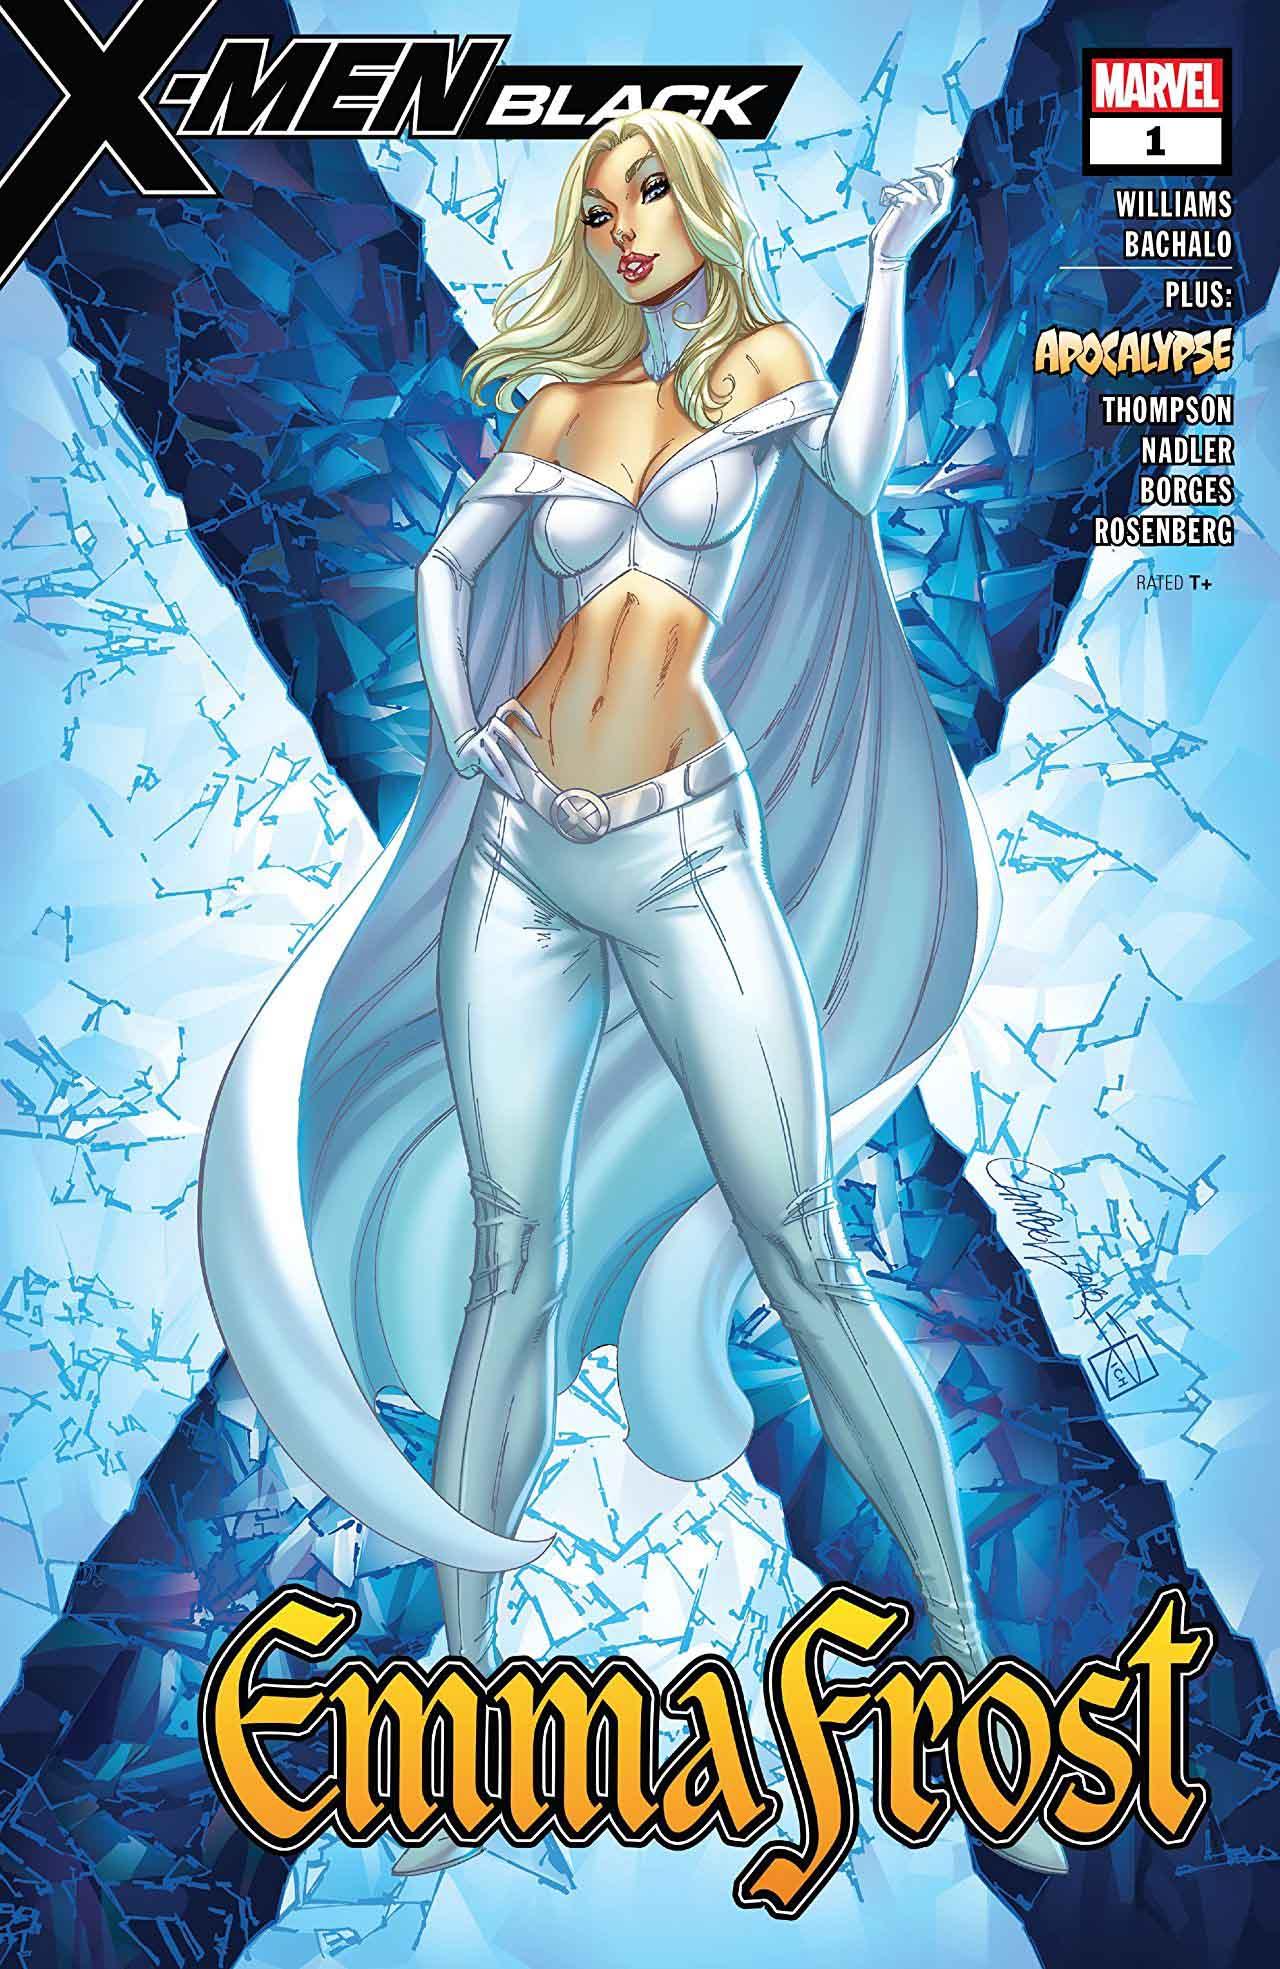 X-Men: Black - Emma Frost